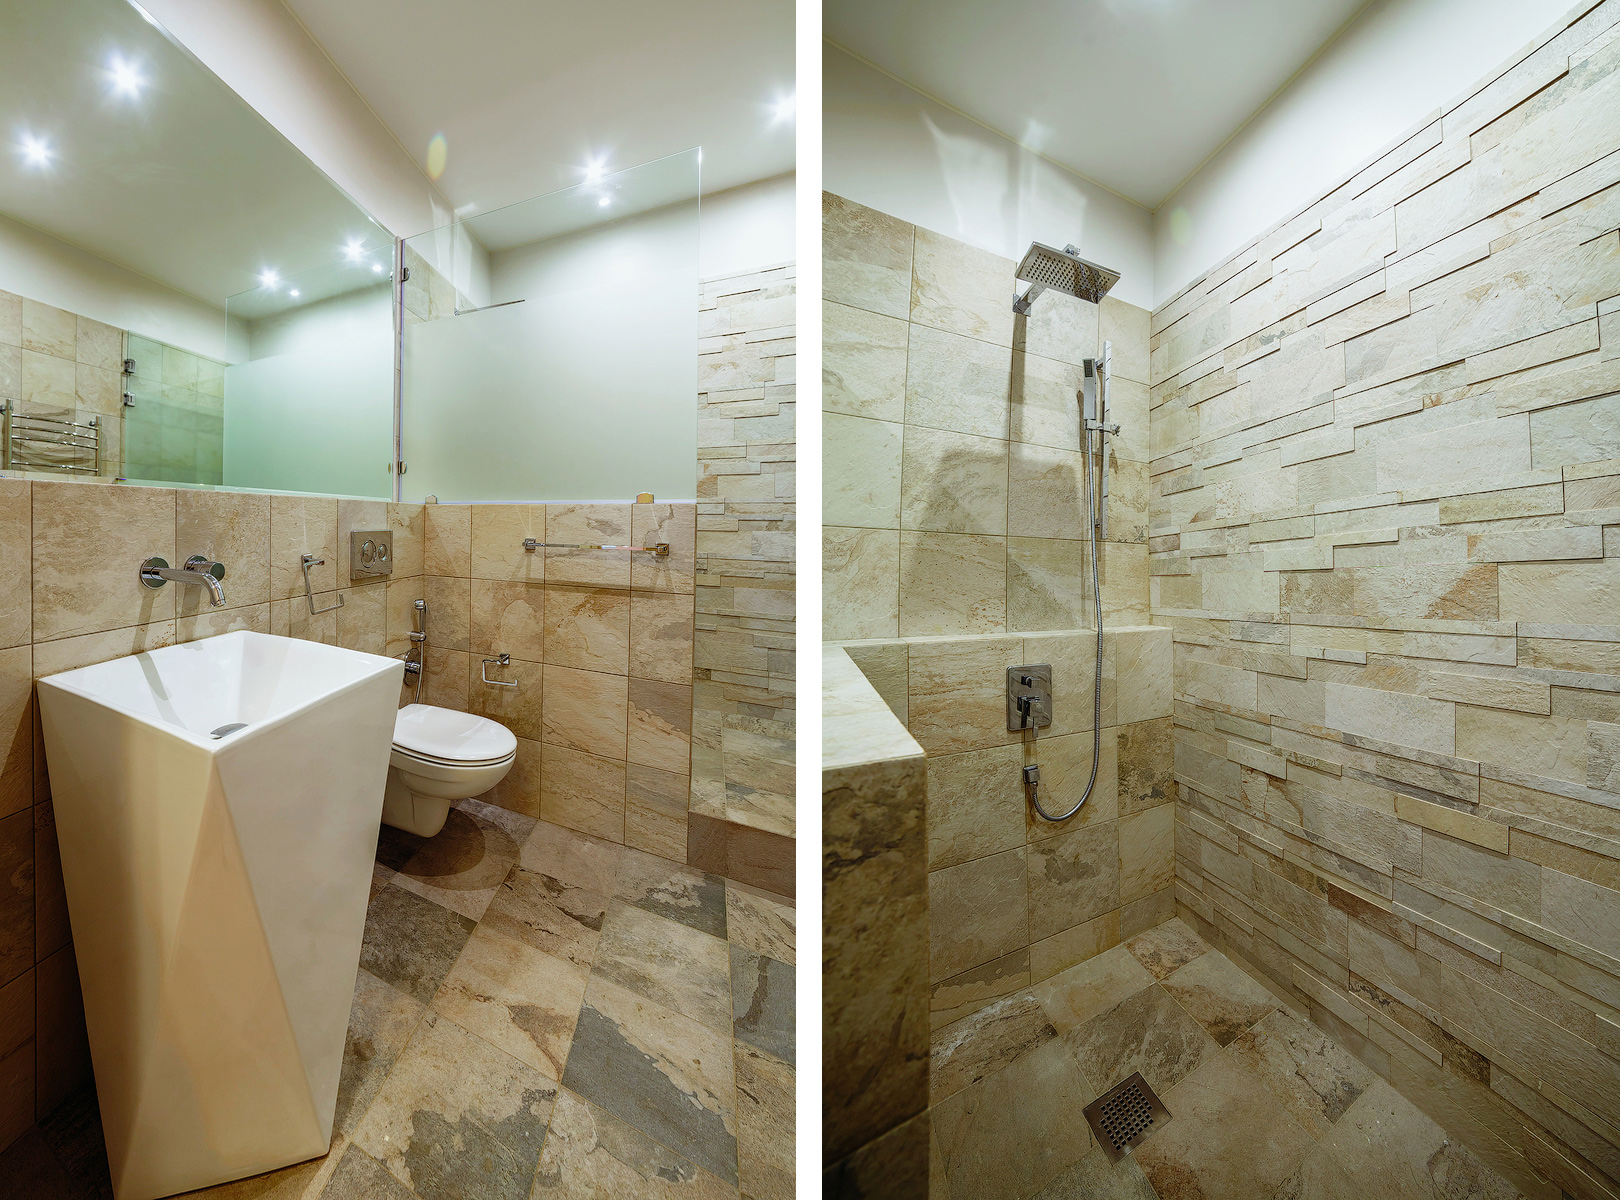 Interior, decor, warm, light, bathroom